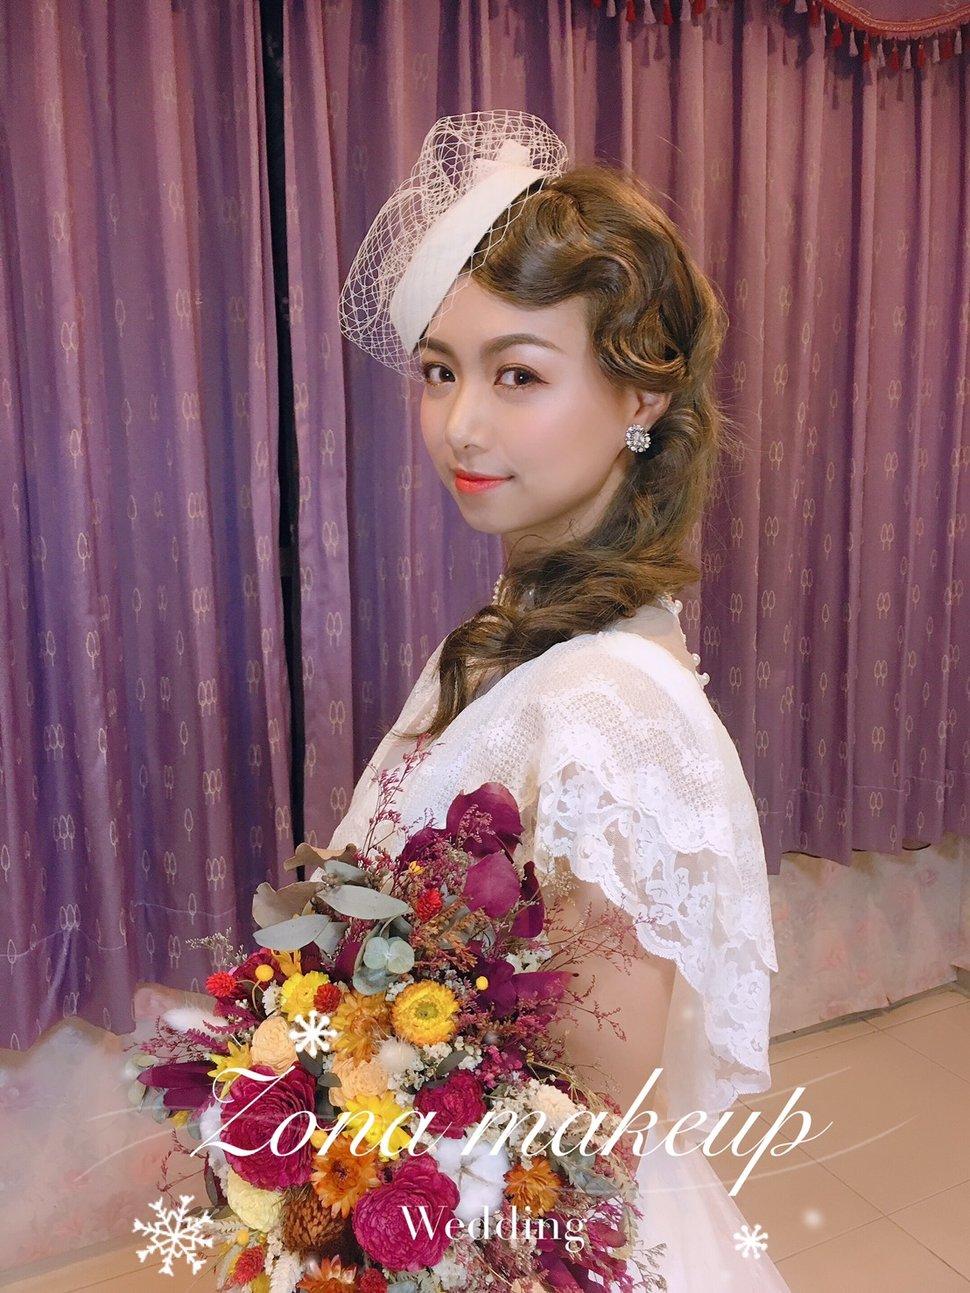 2019410_190410_0084 - Zona時尚美甲x新娘秘書整體造型工作室《結婚吧》